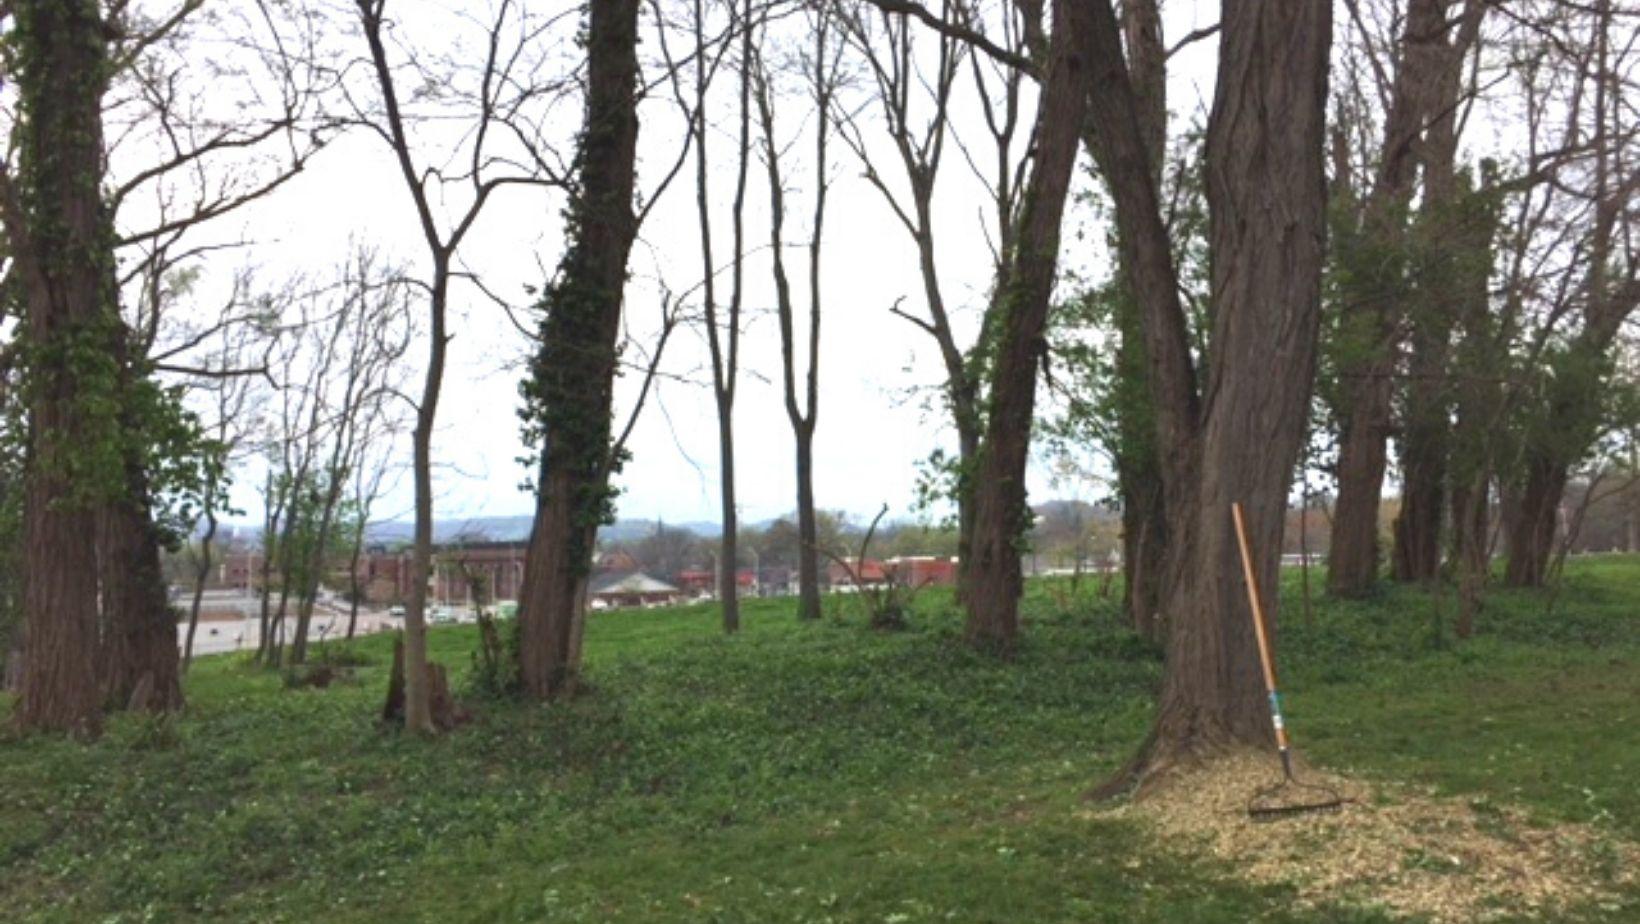 Volunteer work at Carter House clearing leaves